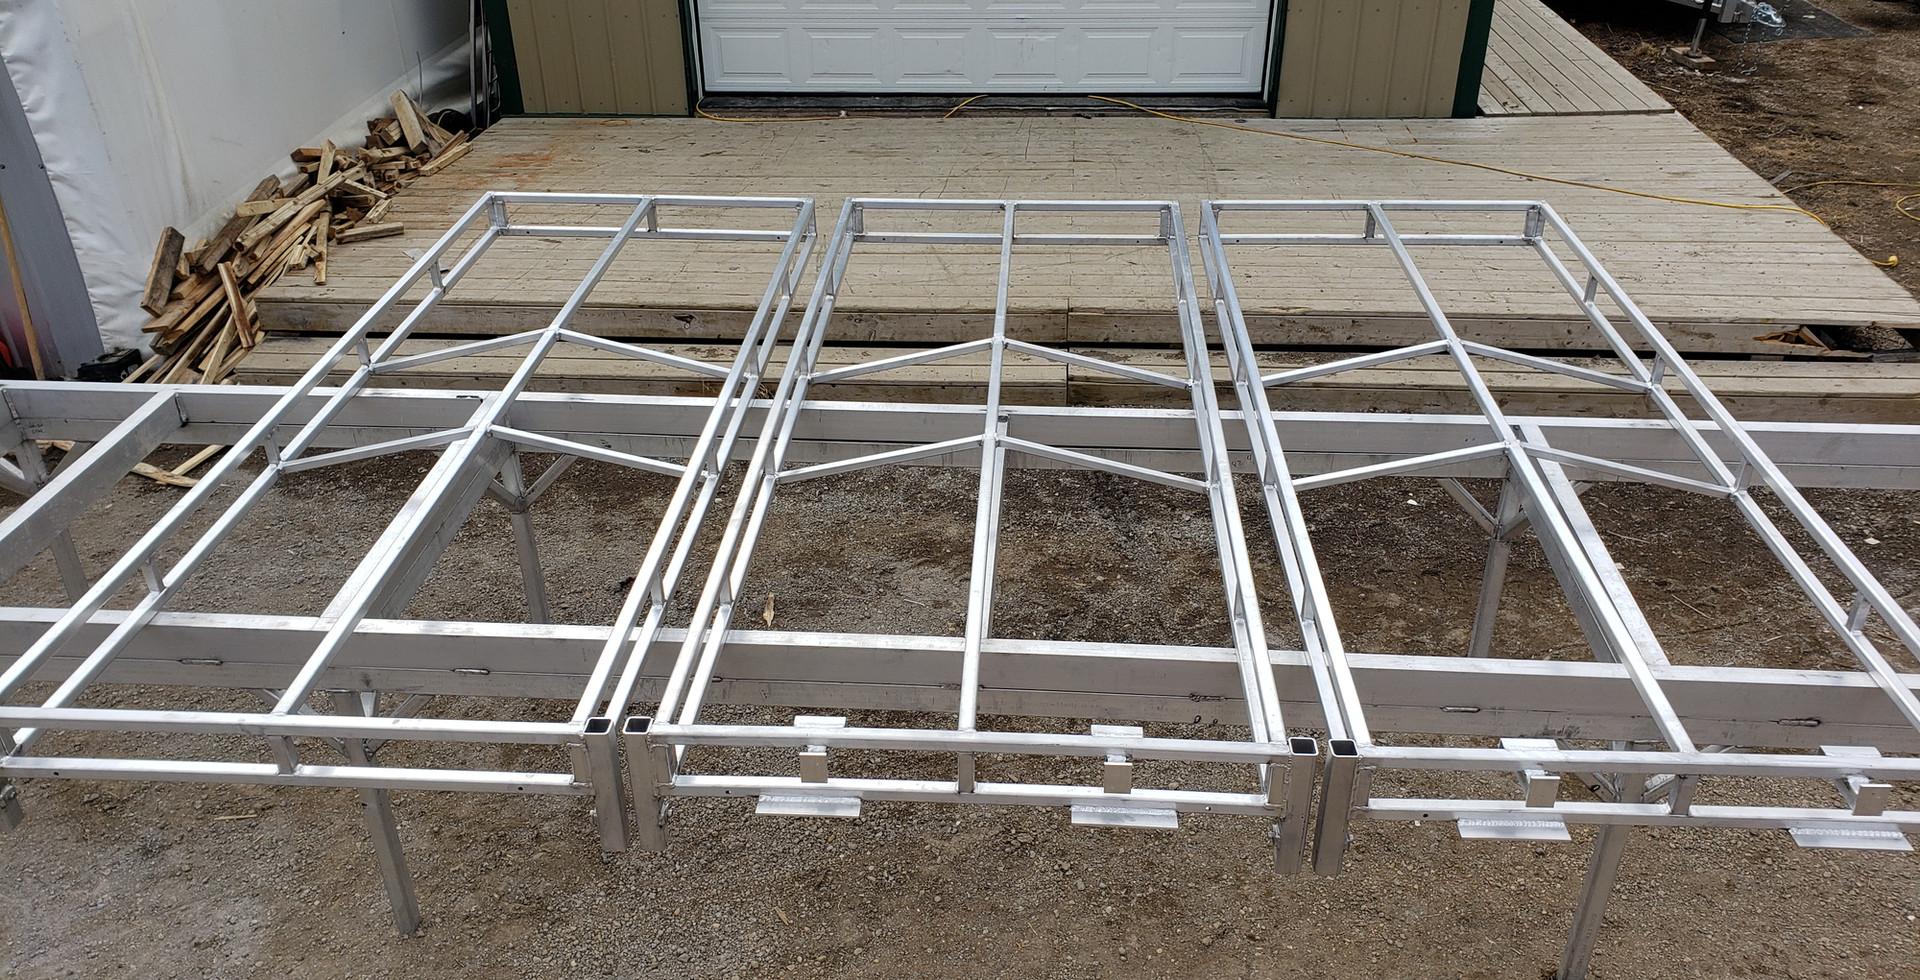 4'x10' Aluminum Dock Frames